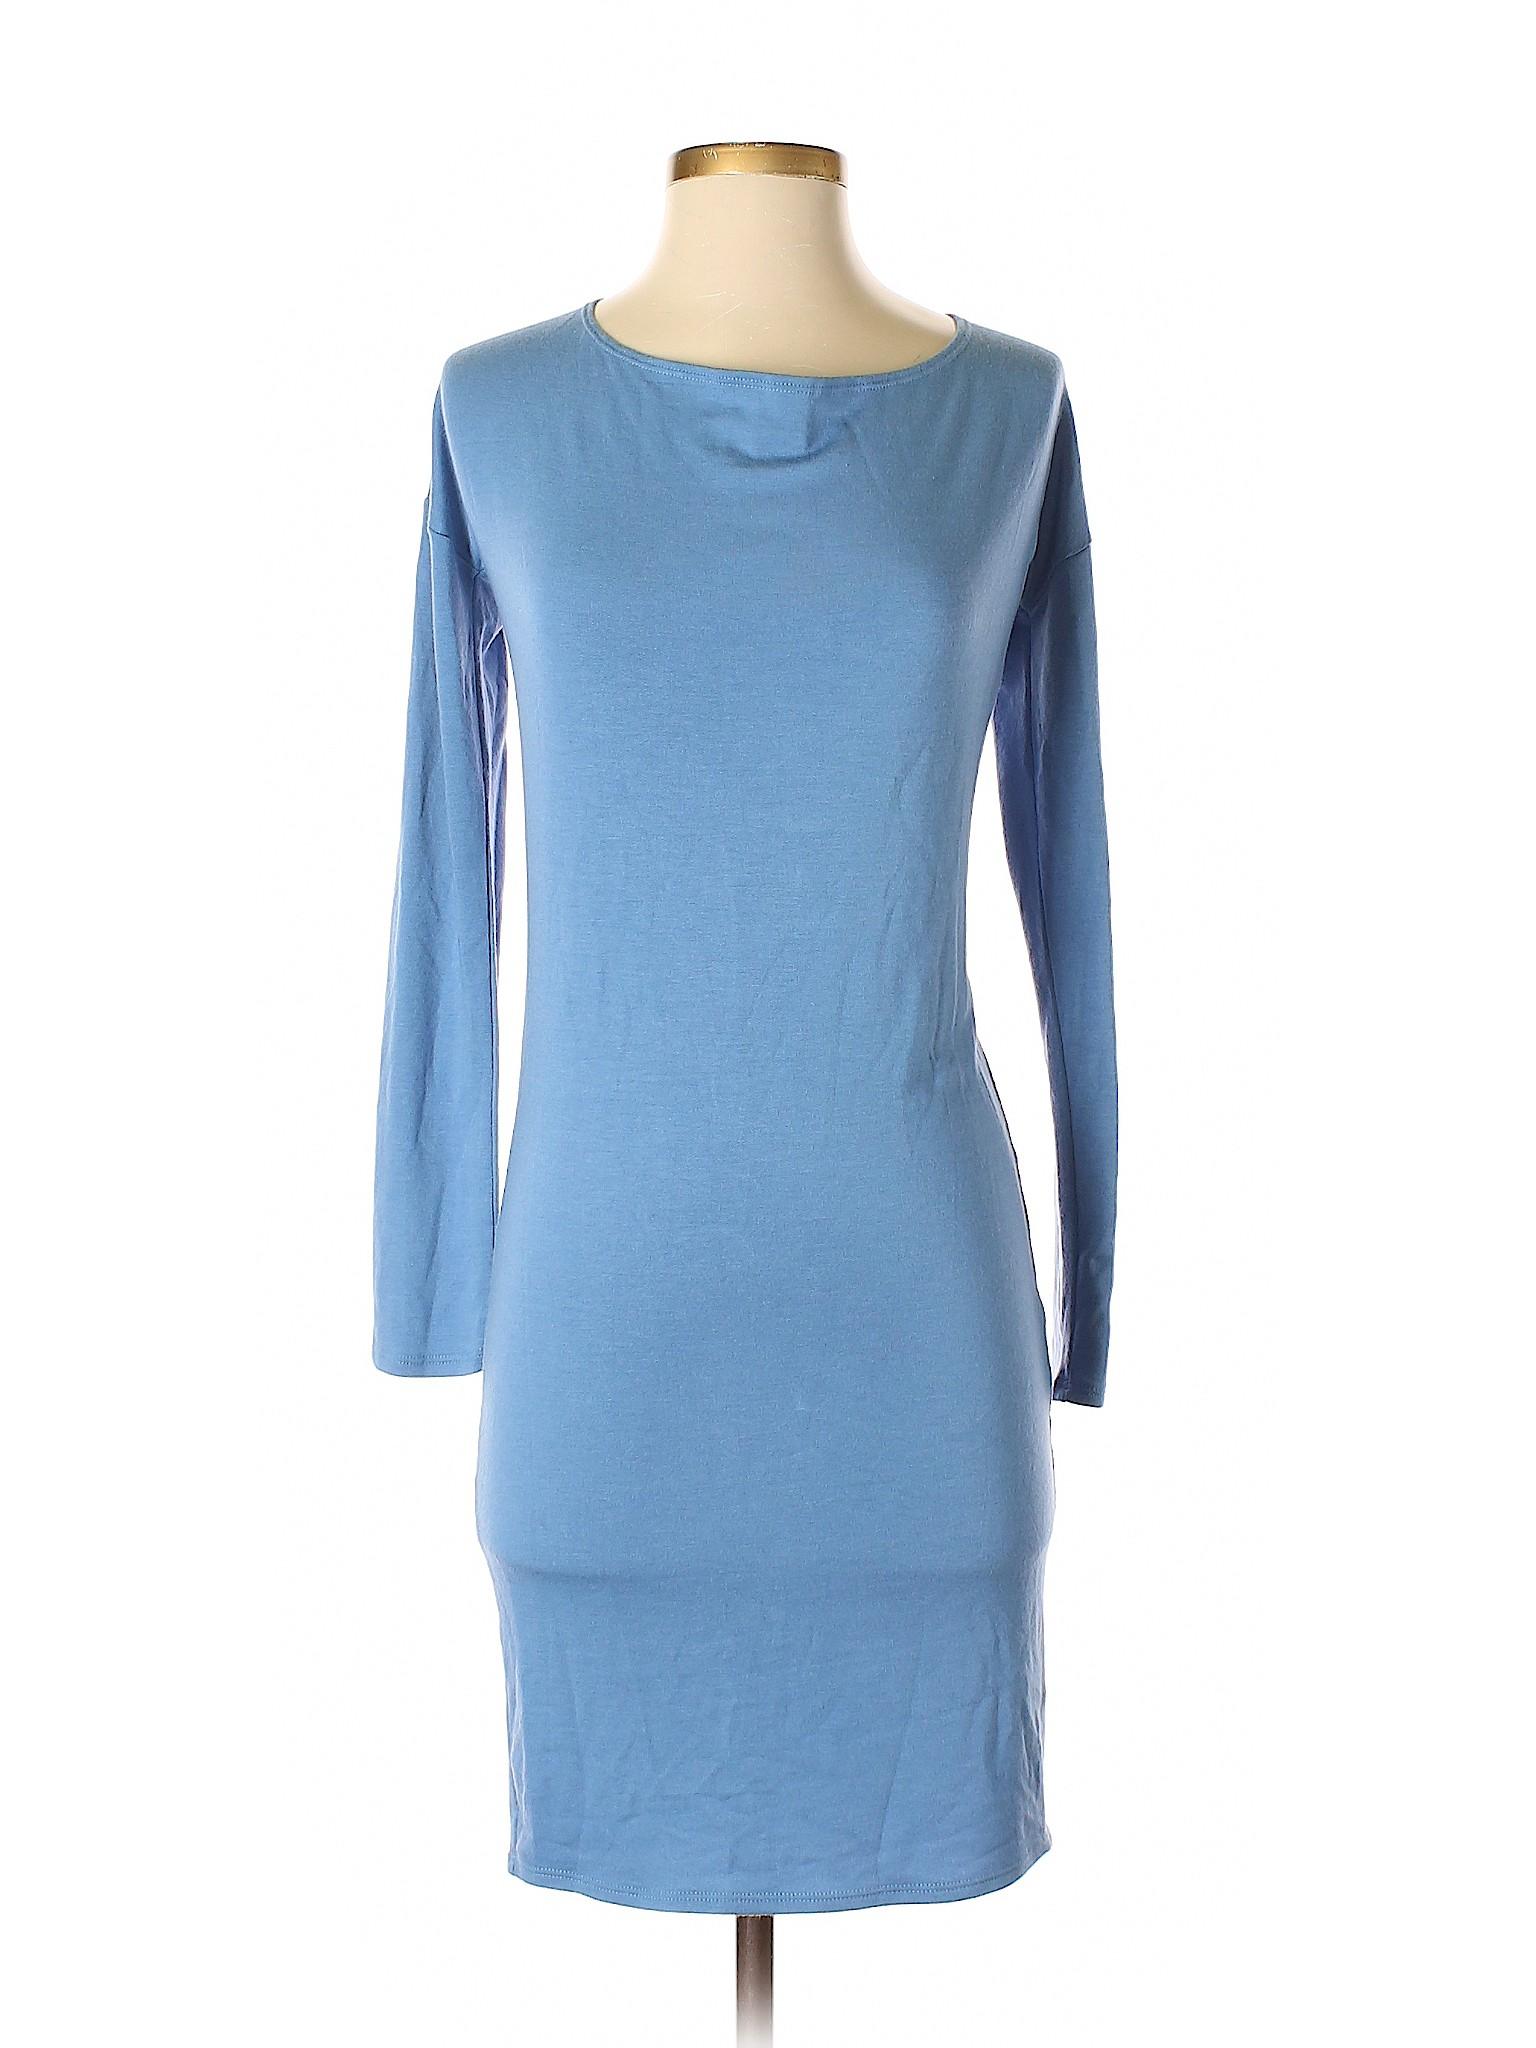 Casual Boutique MICKEY amp; Dress JENNY winter qIr0HxZw0T